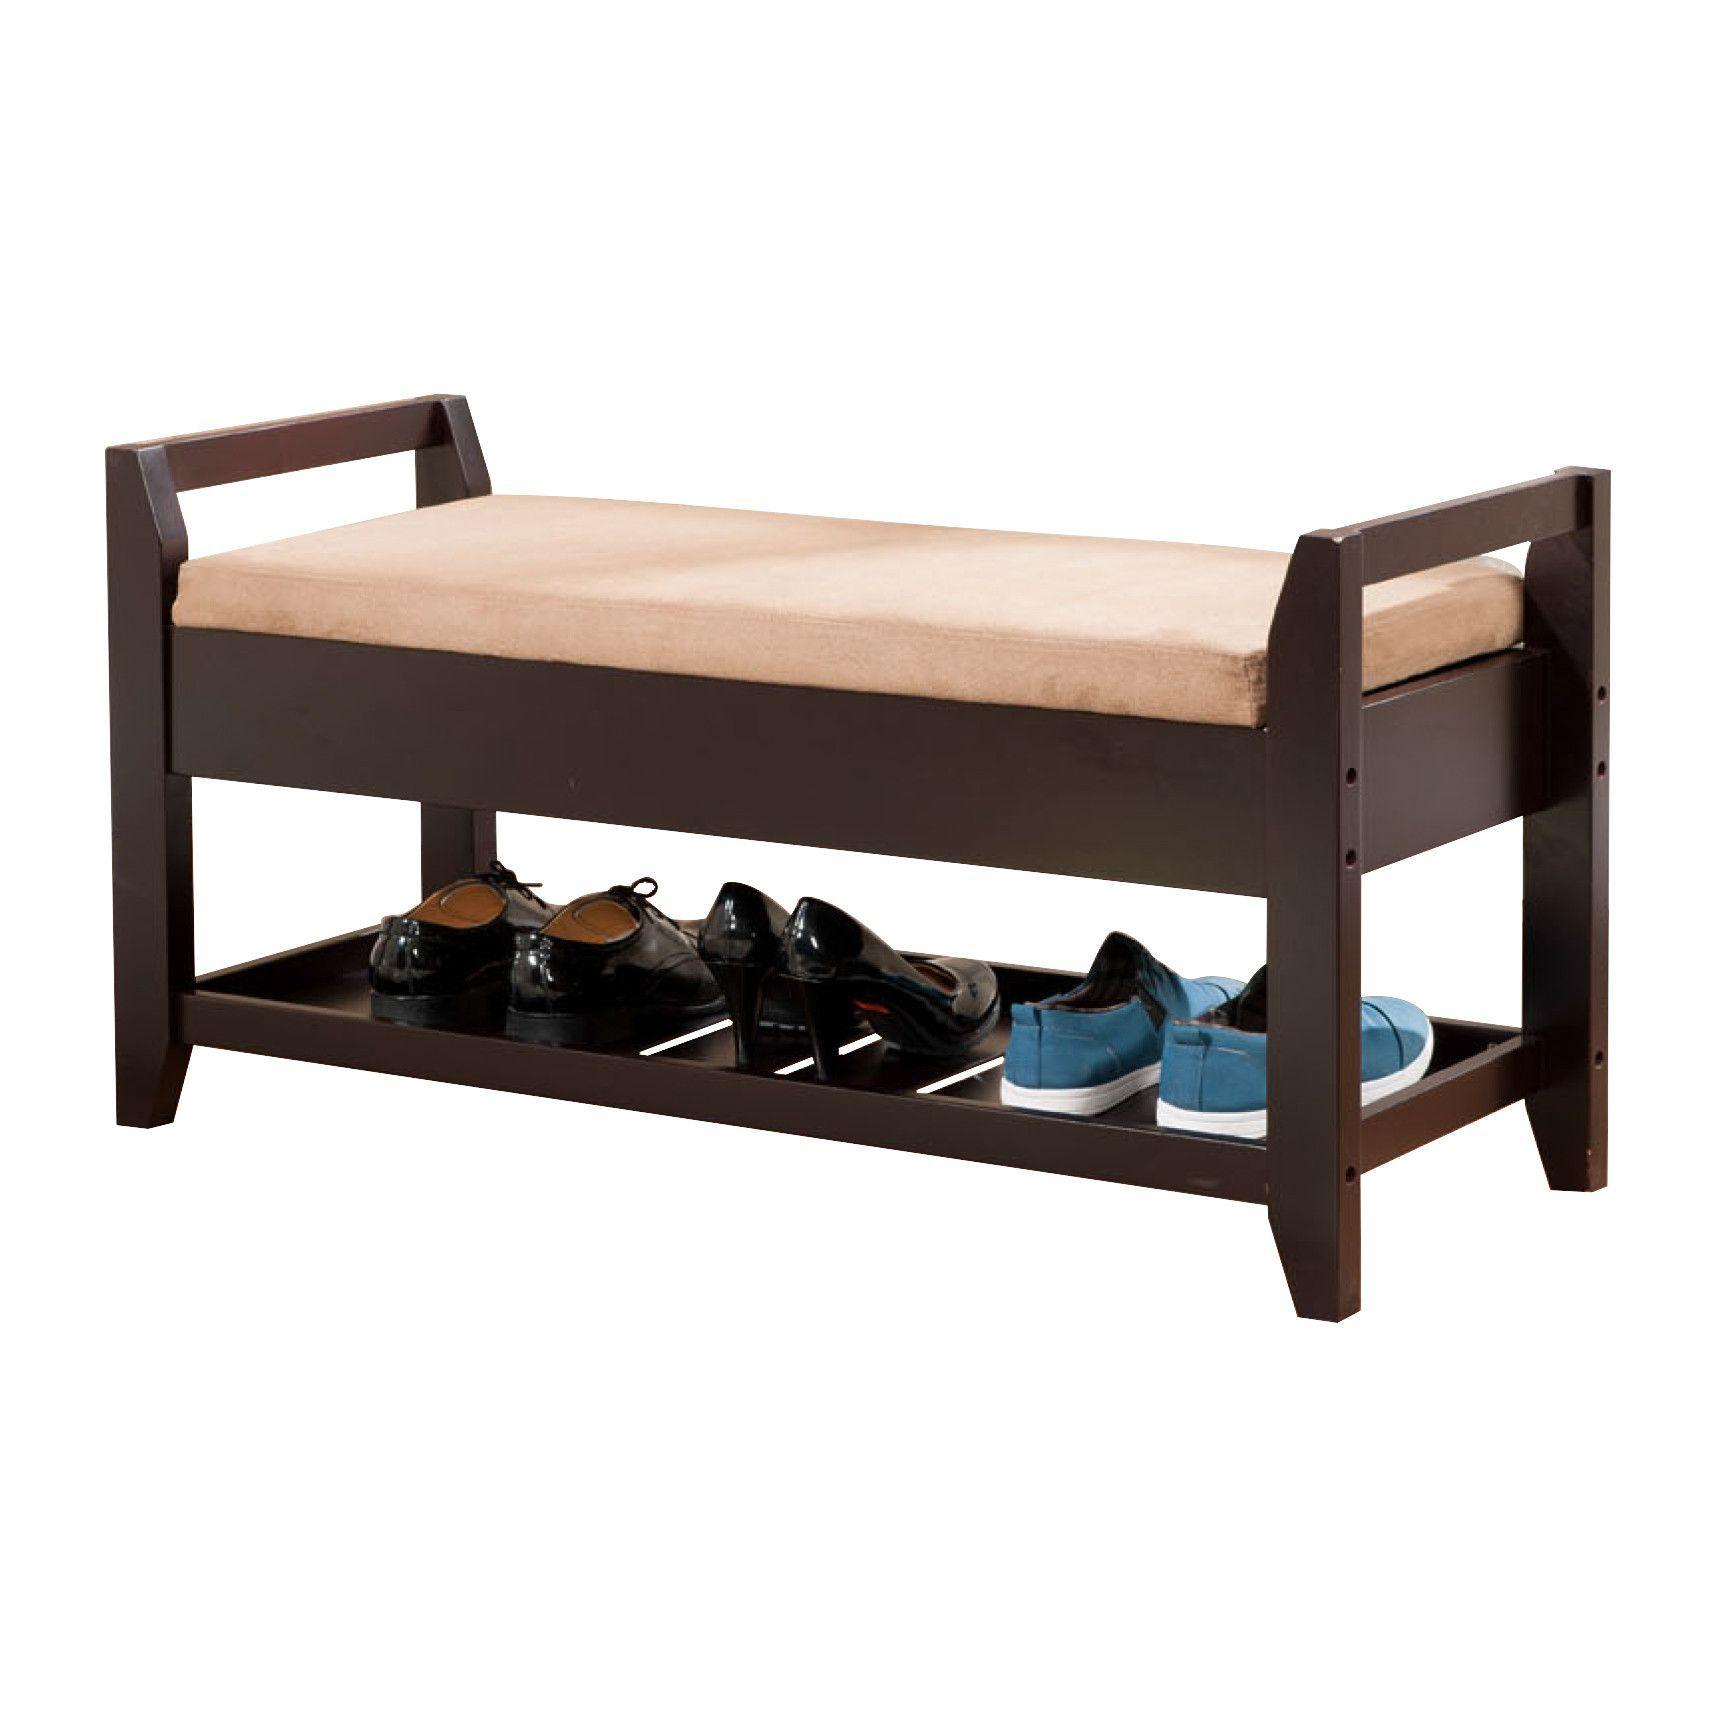 Fabulous Taika Storage Shoe Bench Dark Brown Fabric Espresso Wood Squirreltailoven Fun Painted Chair Ideas Images Squirreltailovenorg